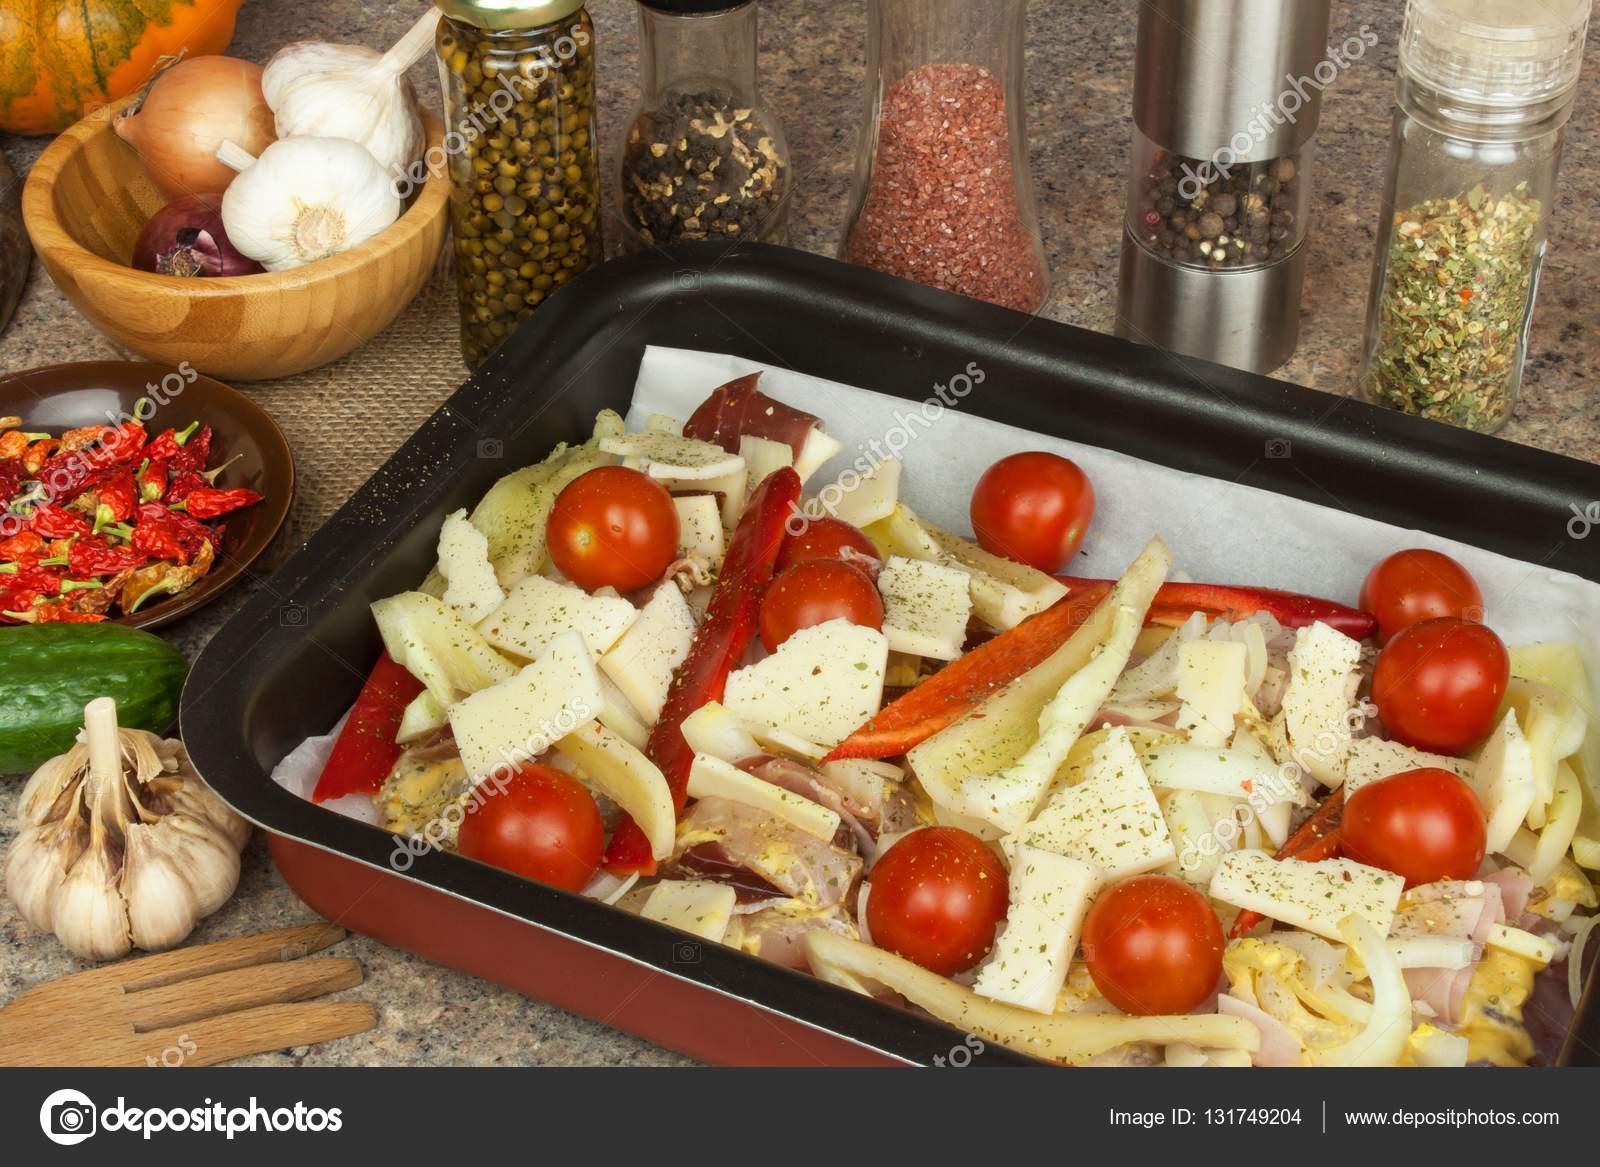 como preparar comidas para hacer dieta